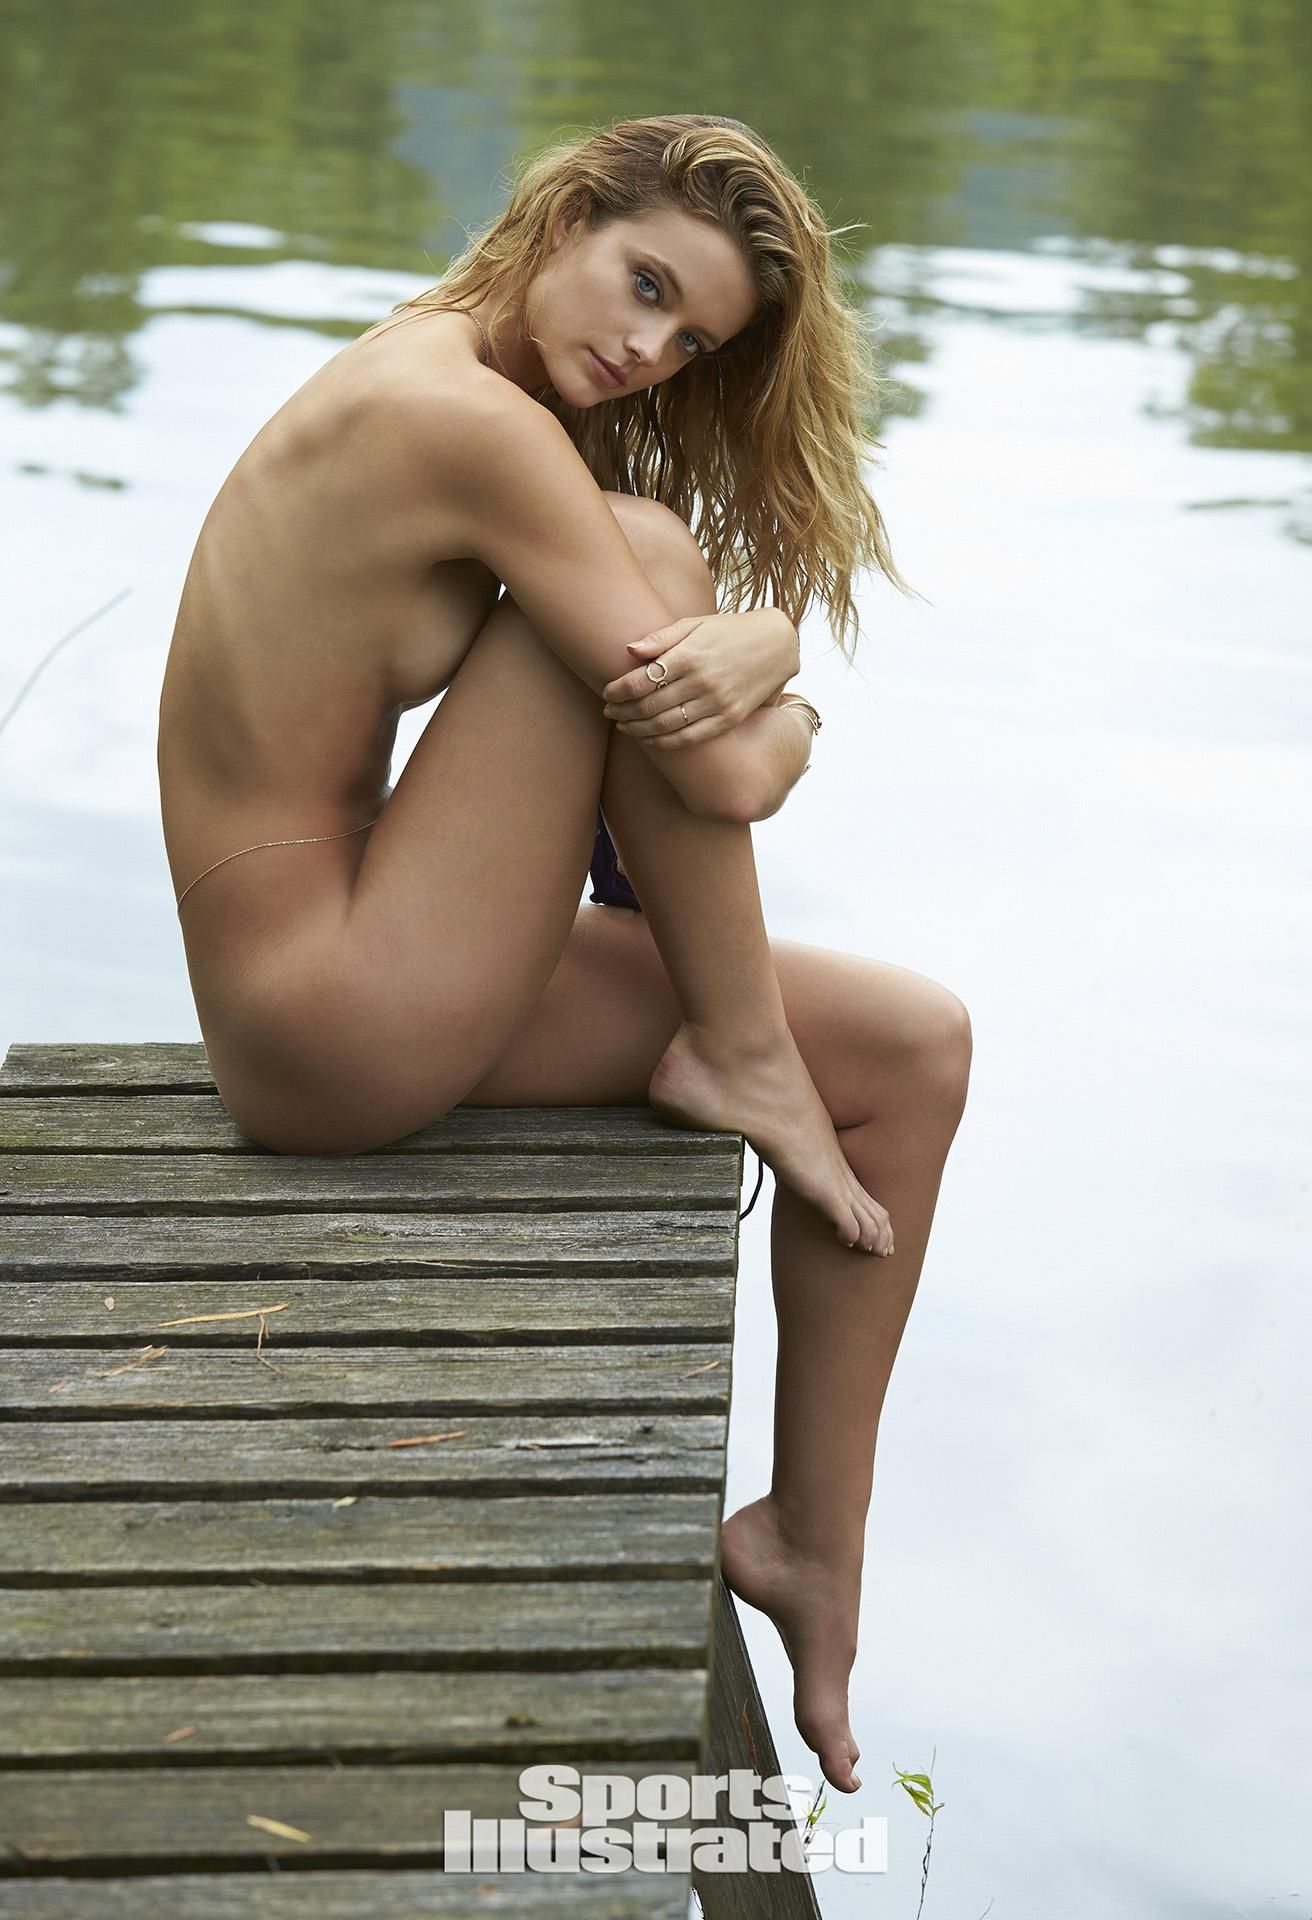 Kate Bock Swimsuit Photos, Sports Illustrated Swimsuit 2015